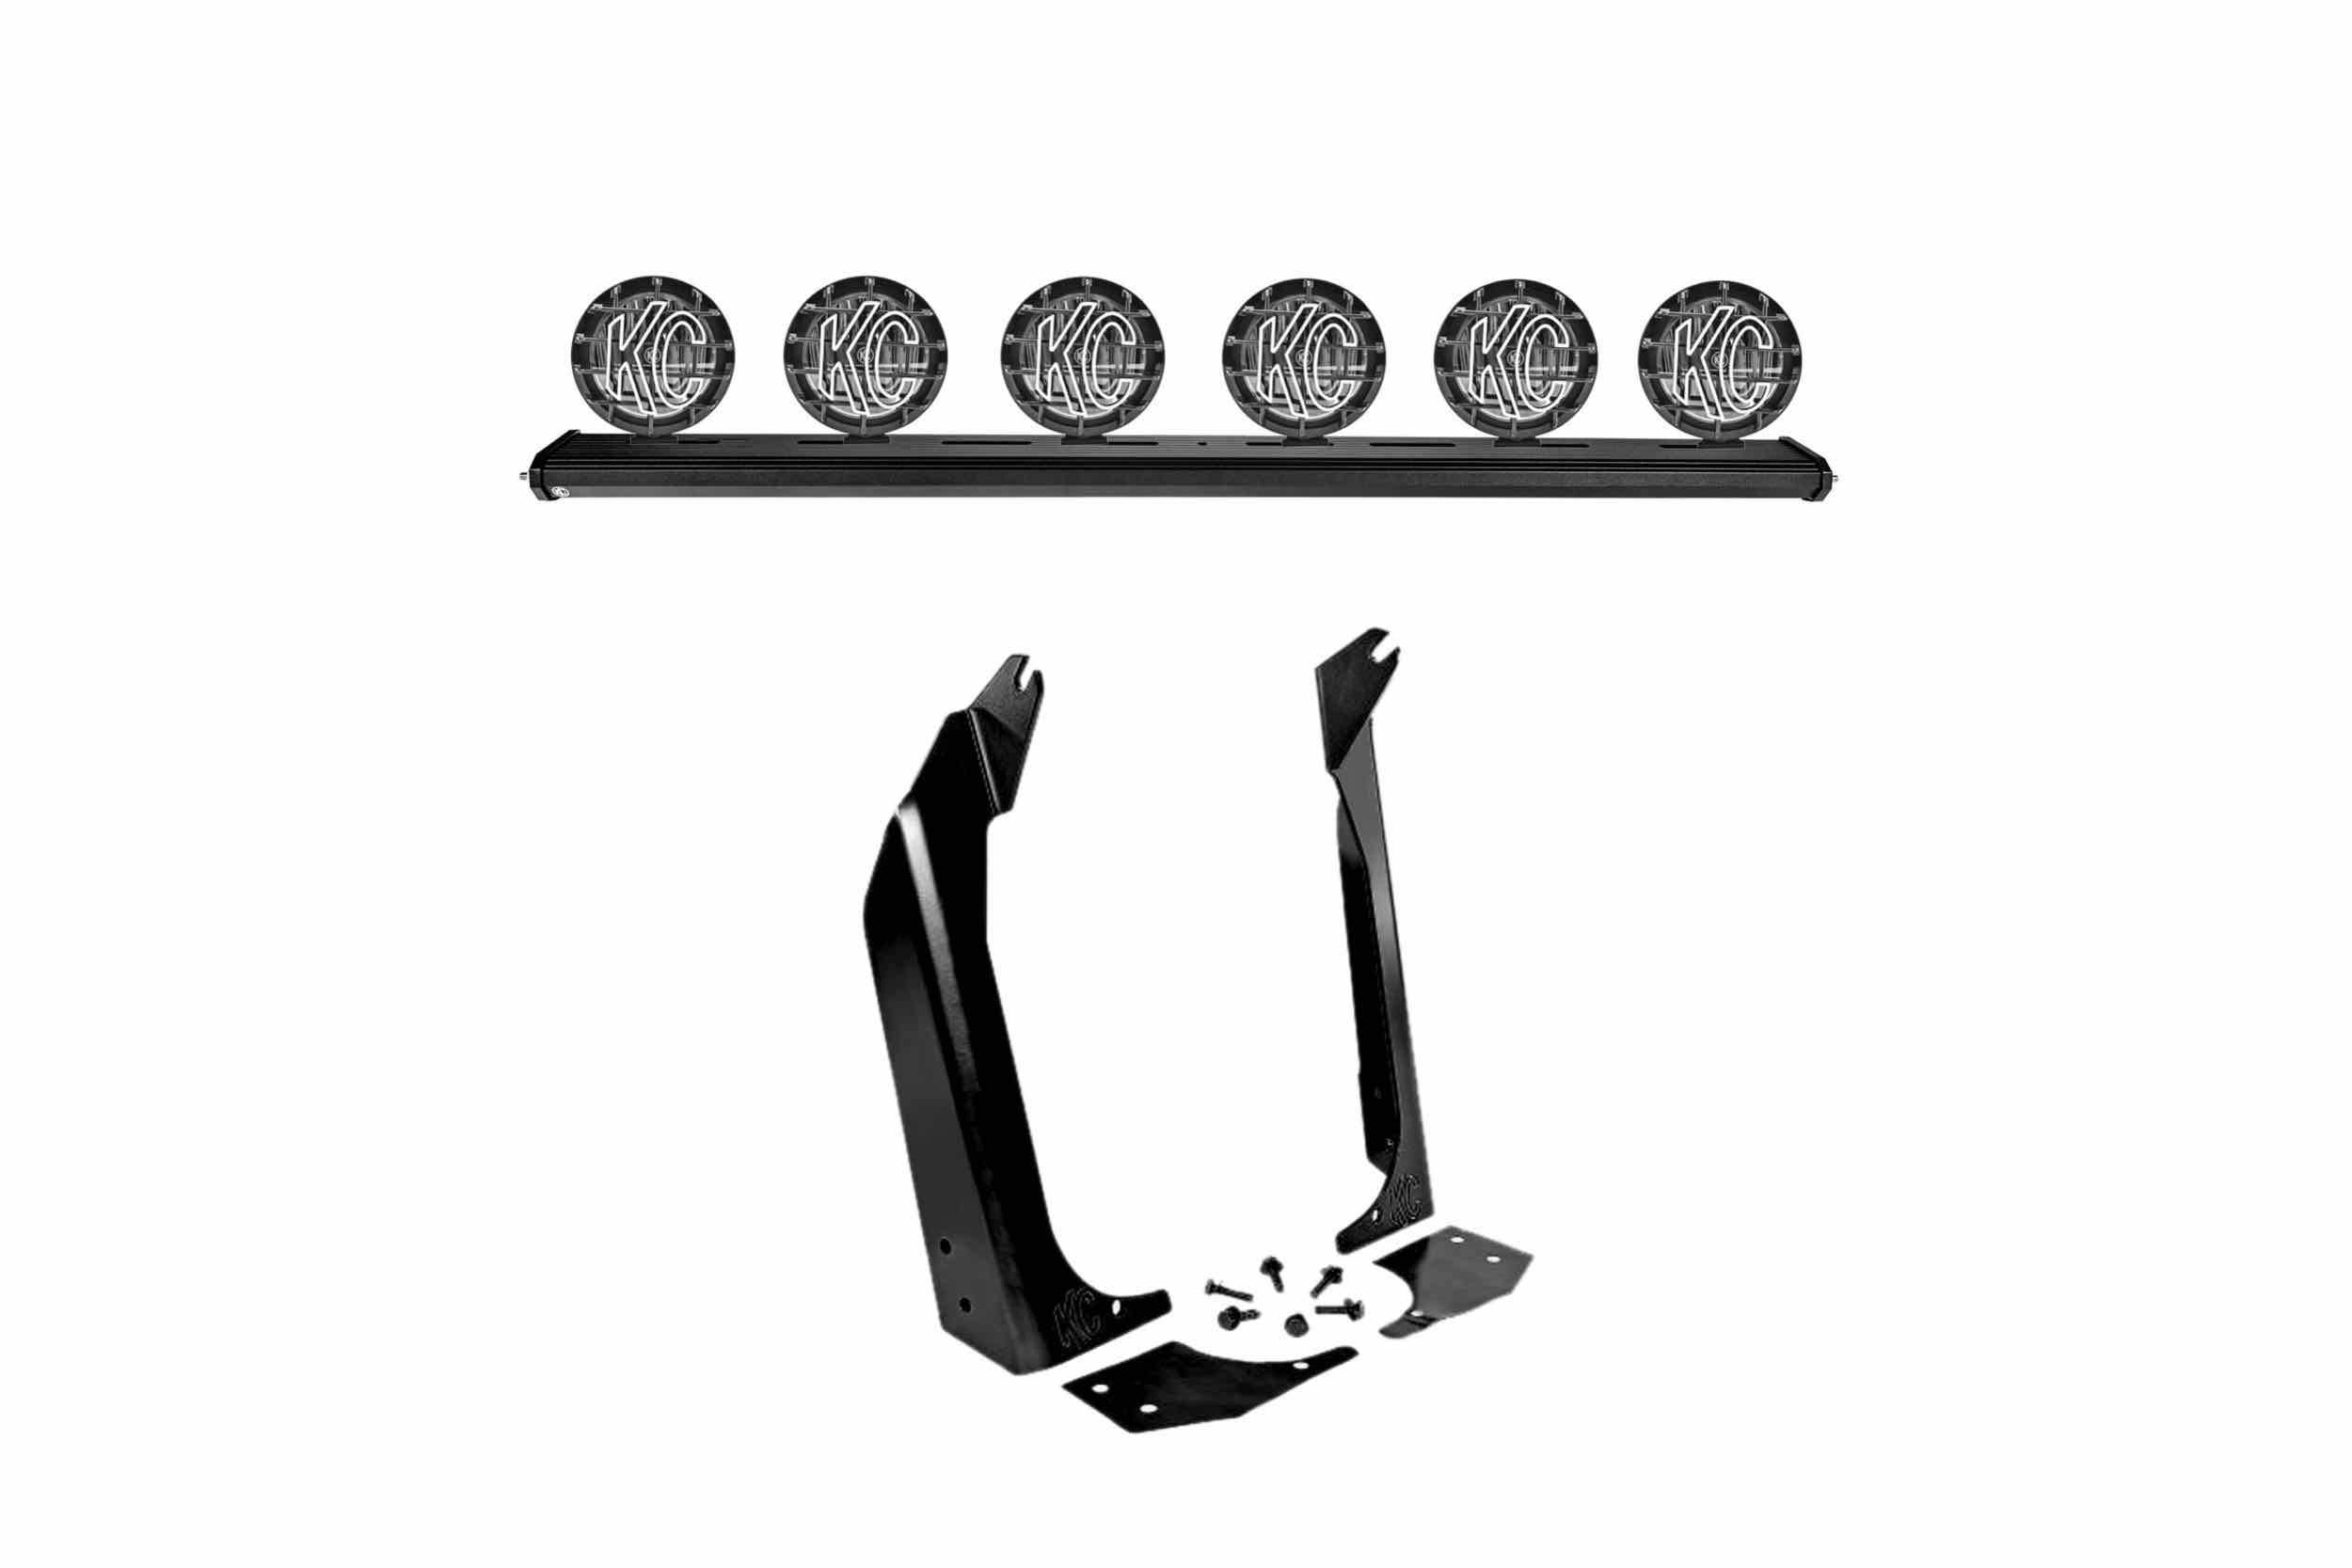 KC Hi-Lites Xross Bar LED Kit For Jeep Wrangler TJ I HR